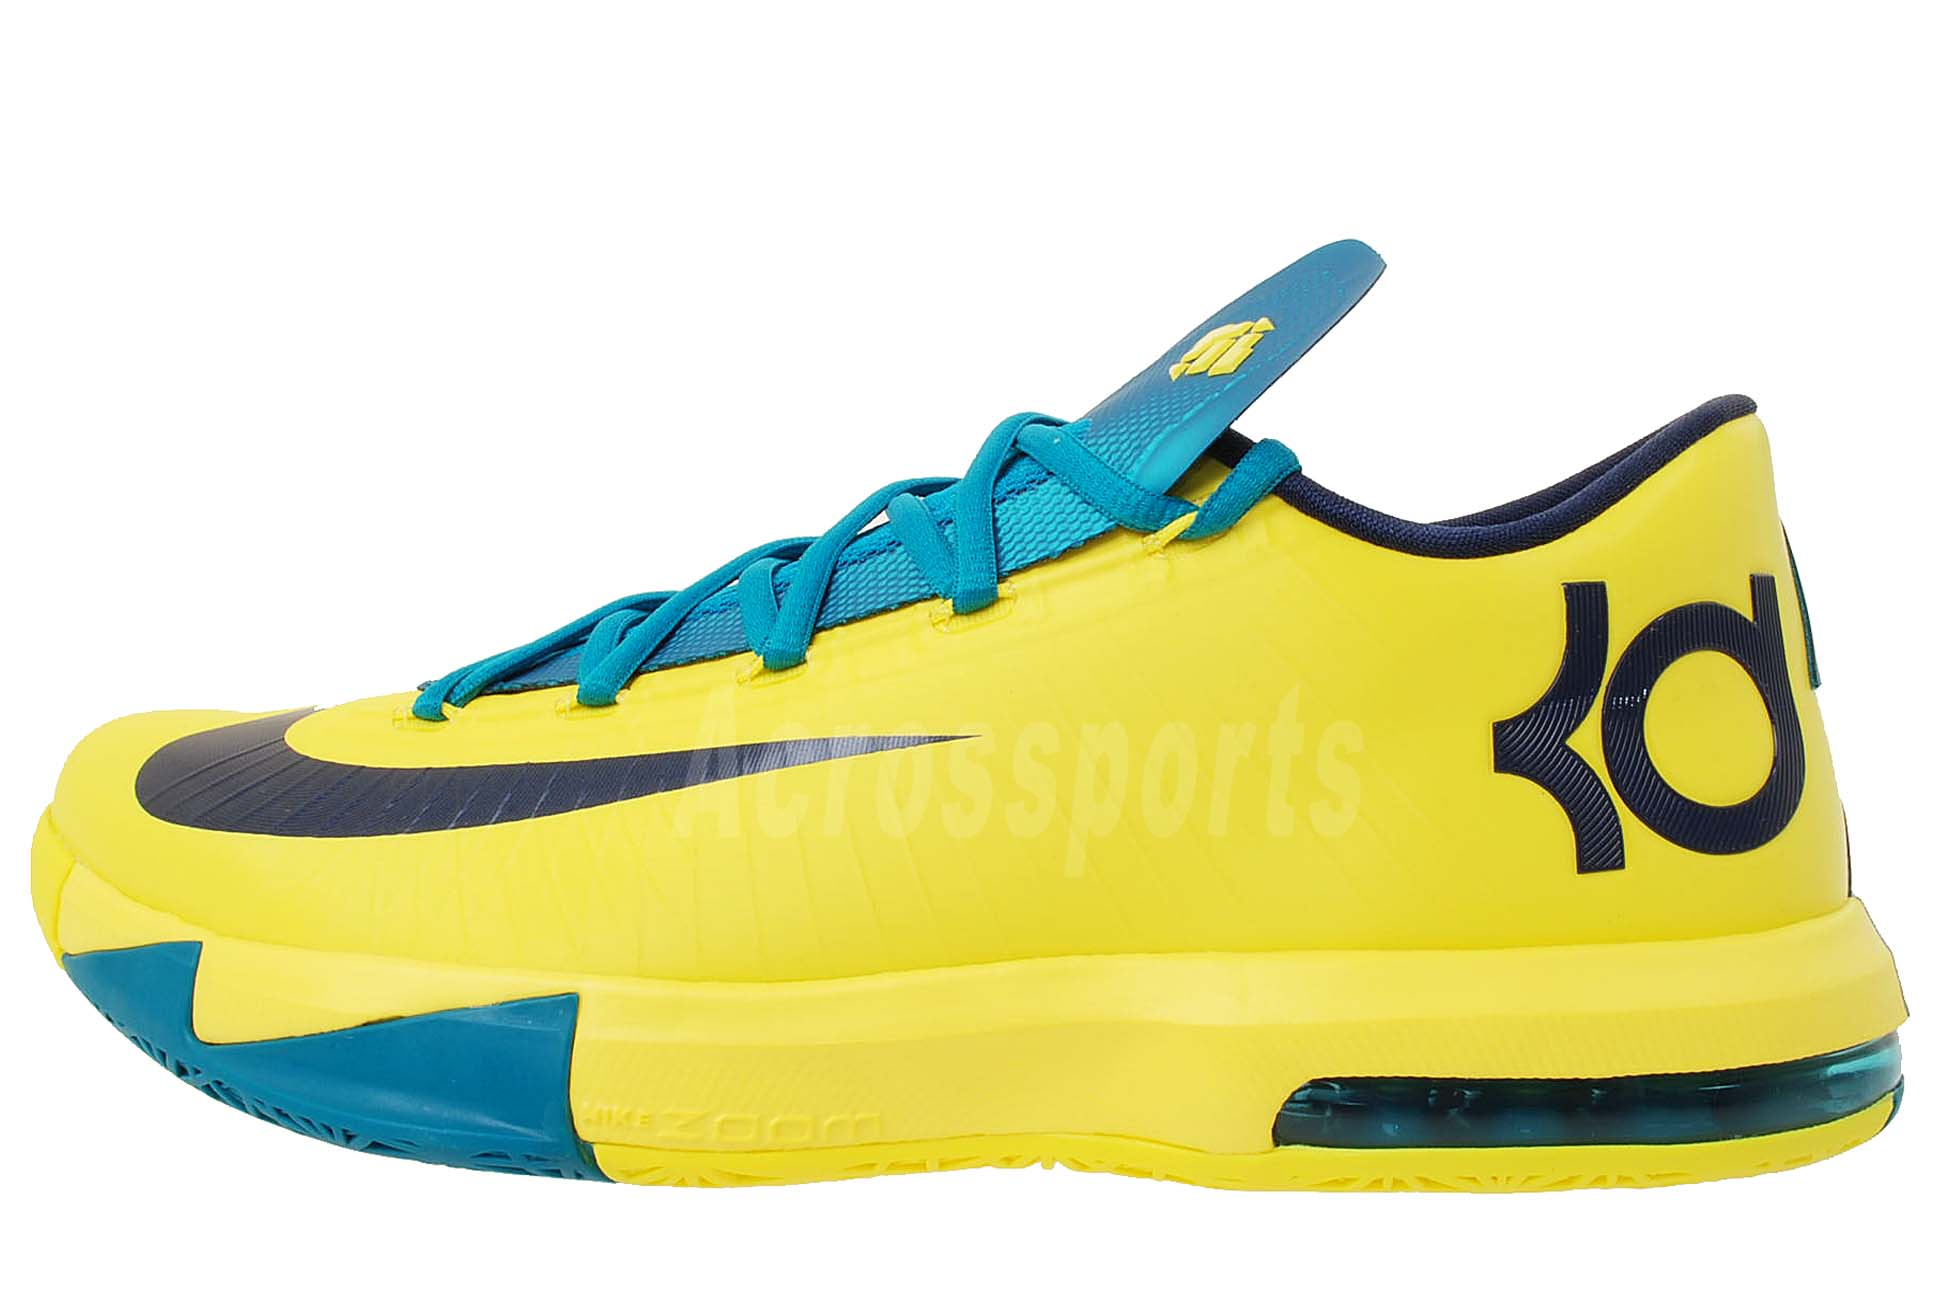 nike kd vi 6 kevin durant zoom air max basketball shoes